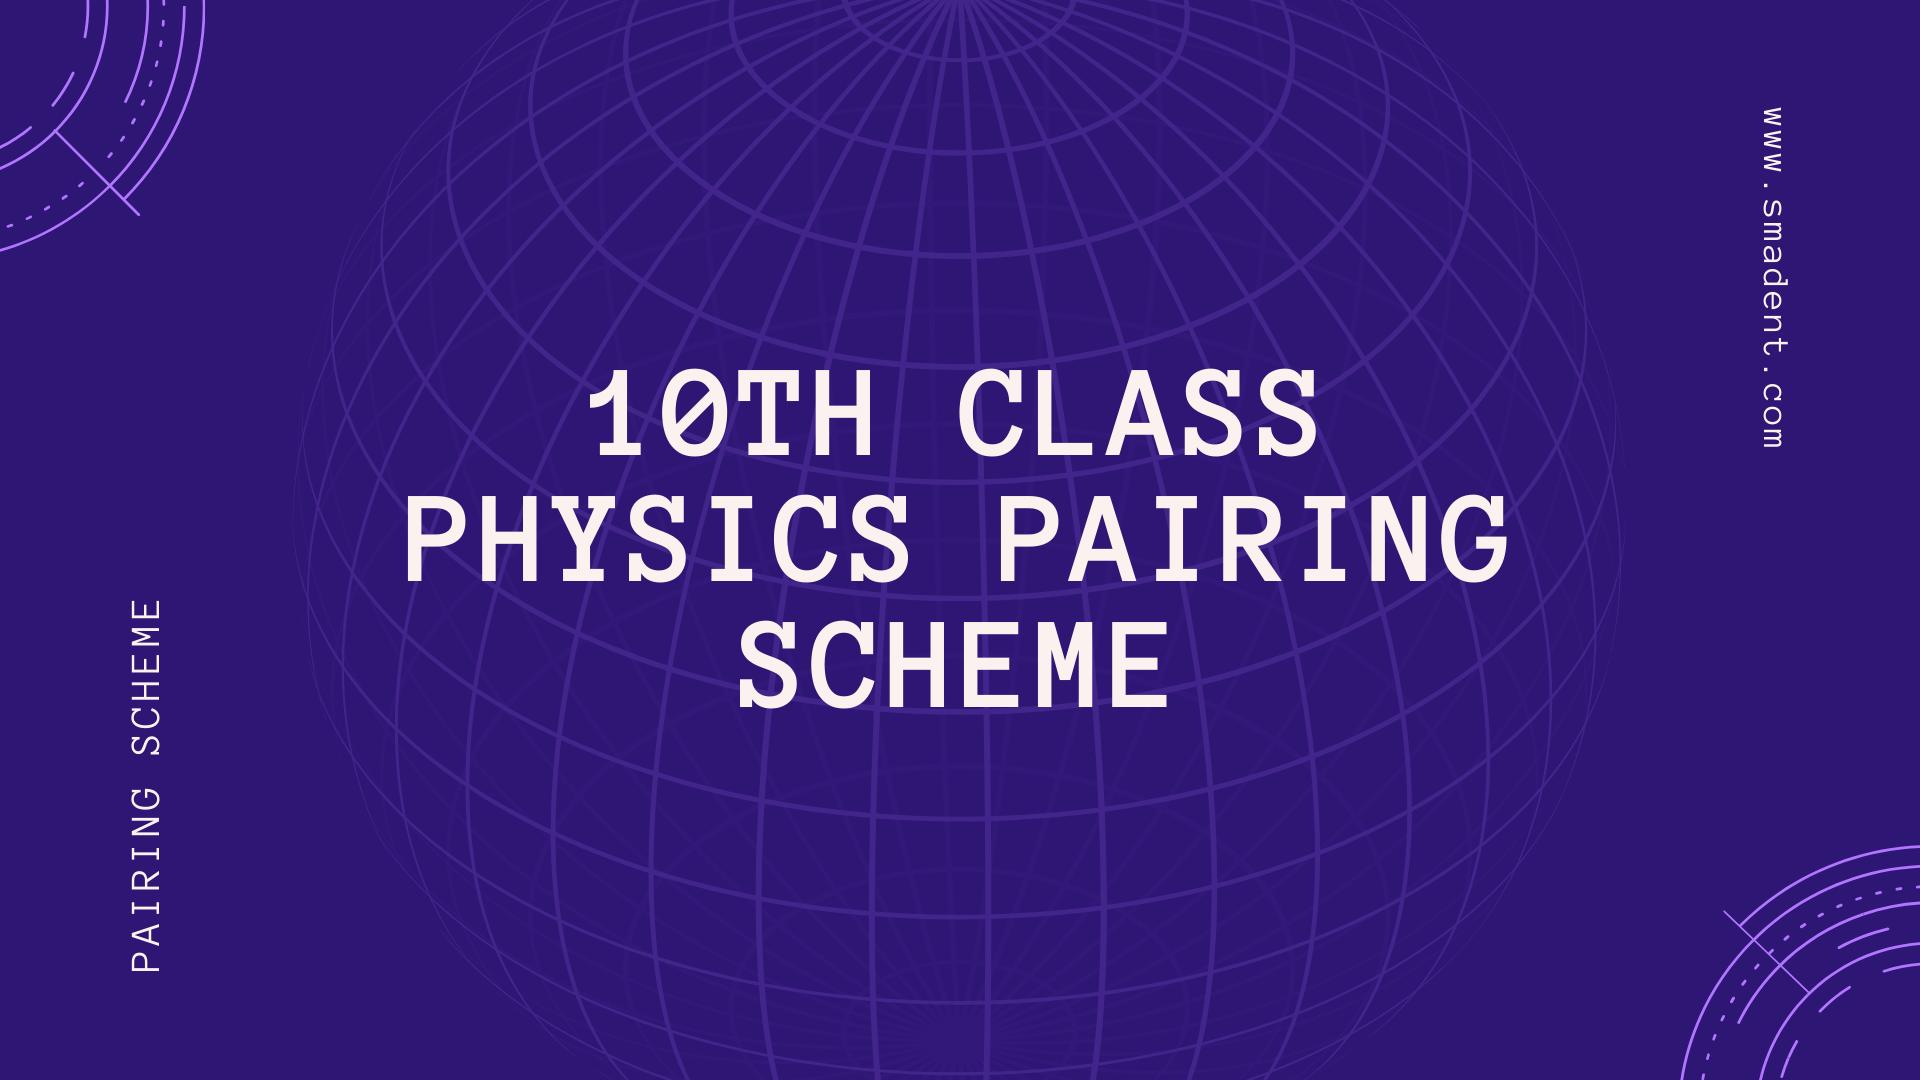 10th Class Physics pairing scheme 2020 | Smadent